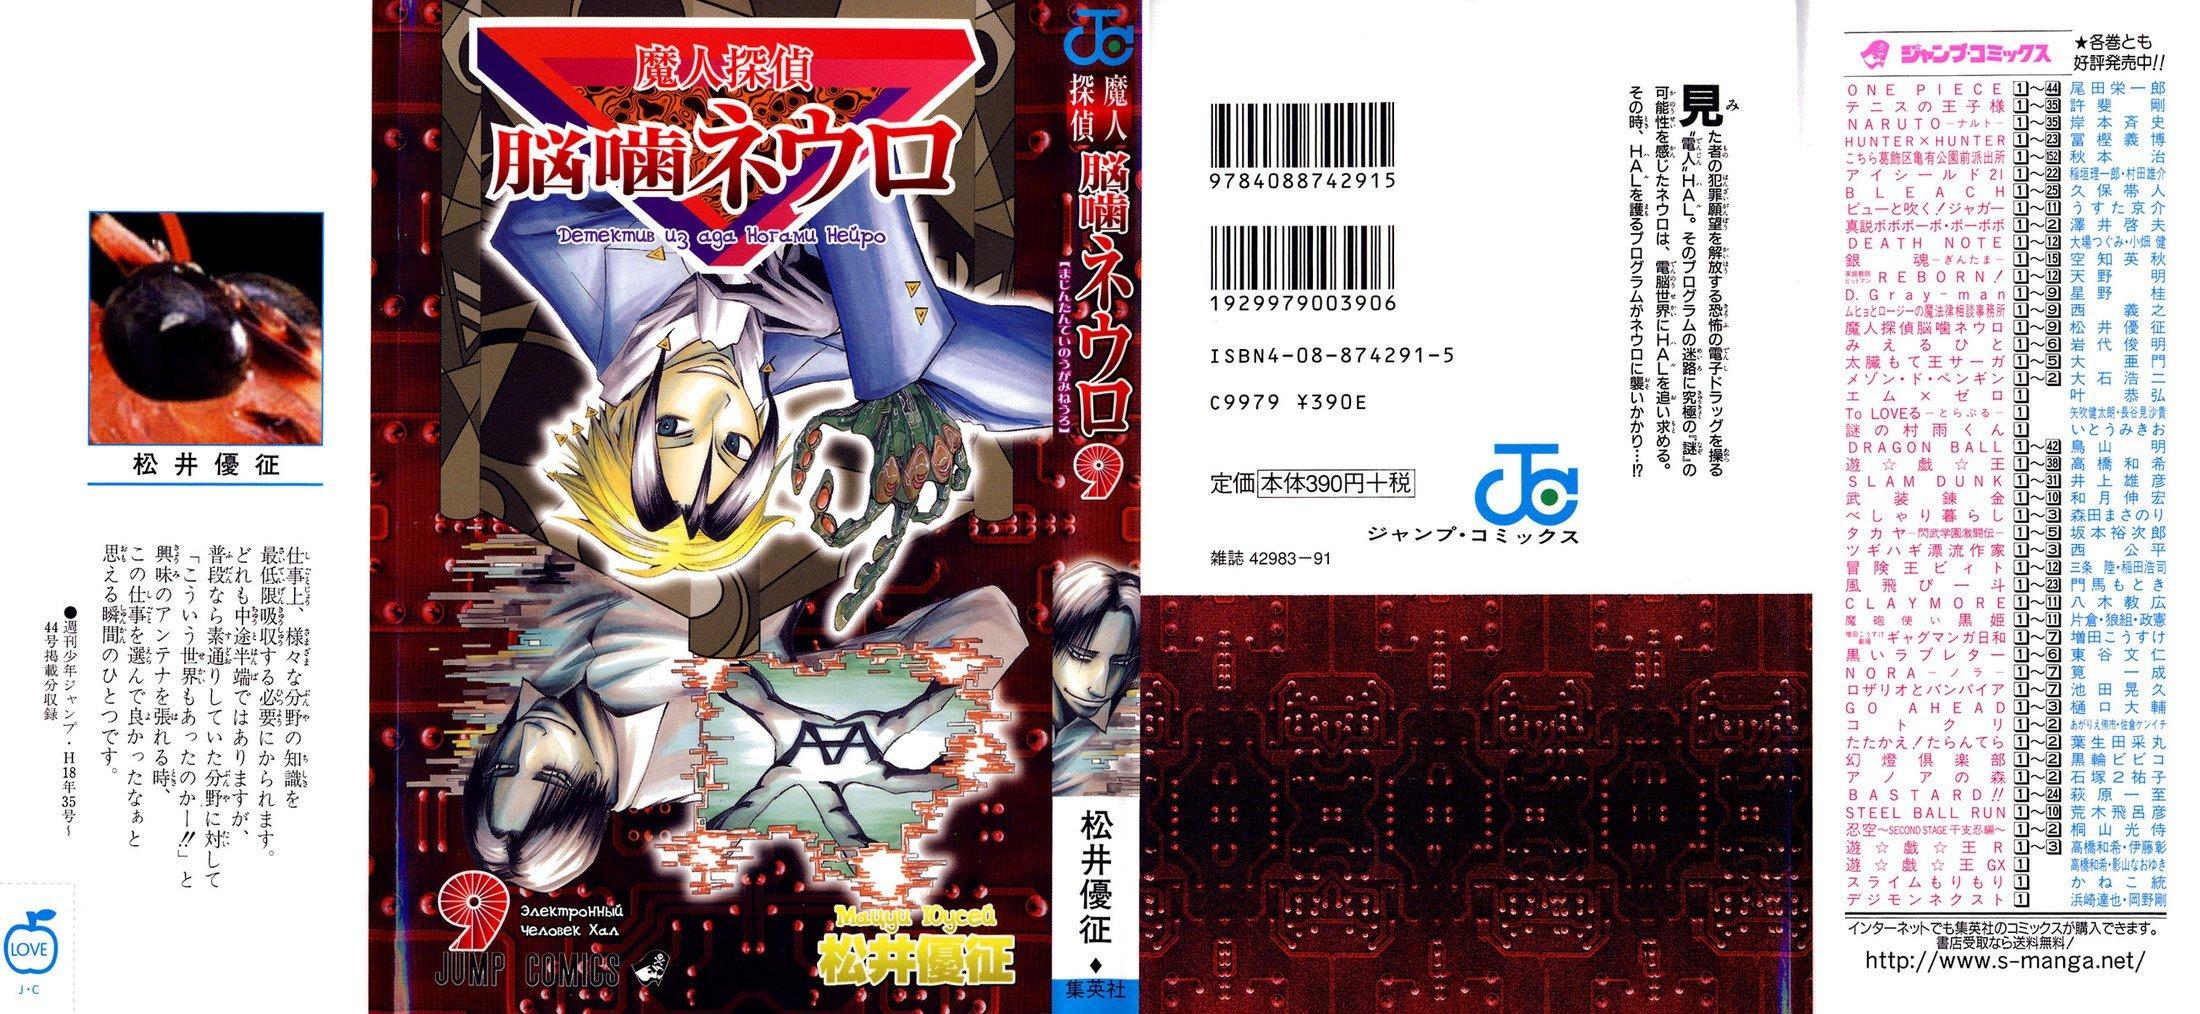 Манга Нейро Ногами - детектив из Ада - Глава 71 Страница 1